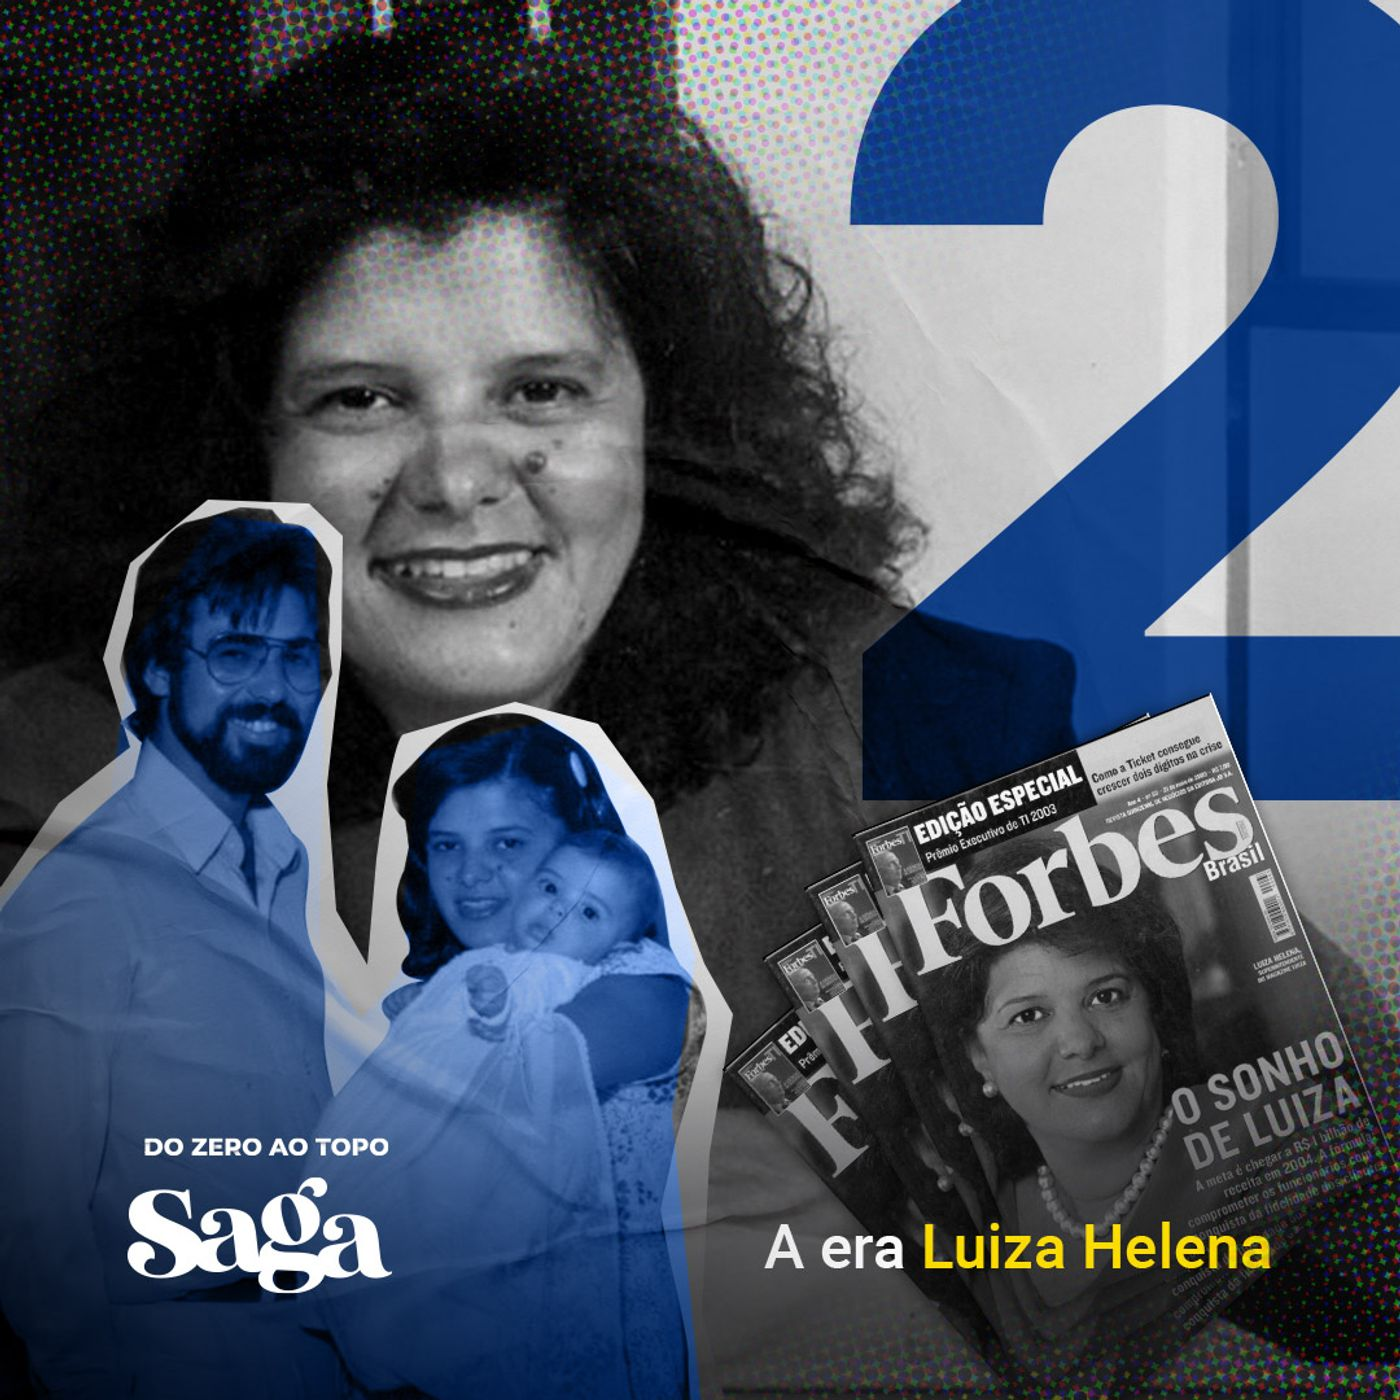 SAGA Magalu   2. A era Luiza Helena